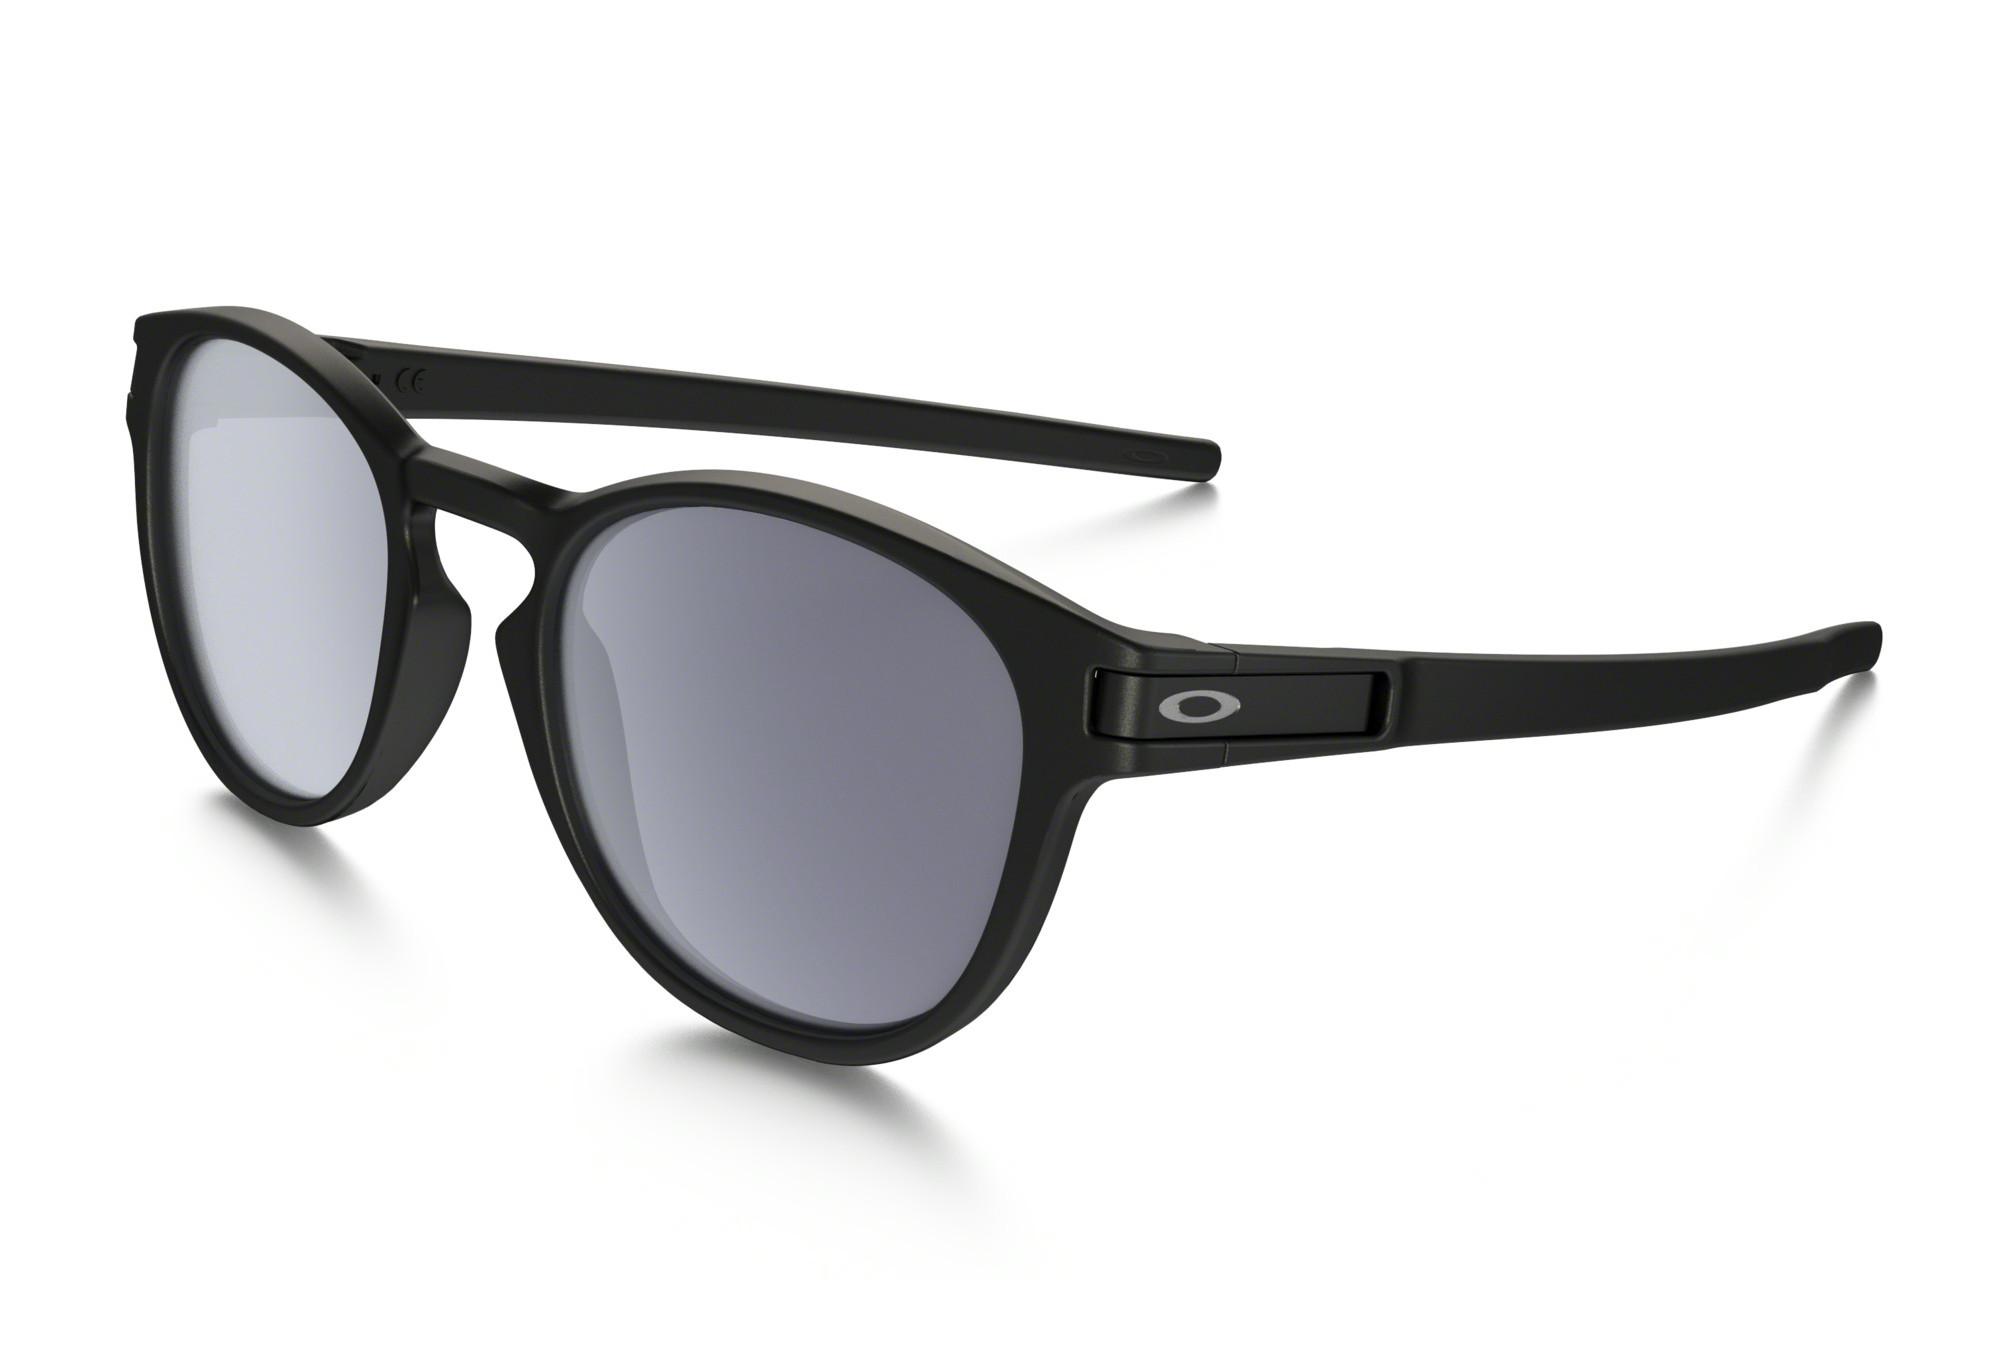 ddf344d4ff7 OAKLEY Sunglasses LATCH Matte Black Grey Ref OO9265-01